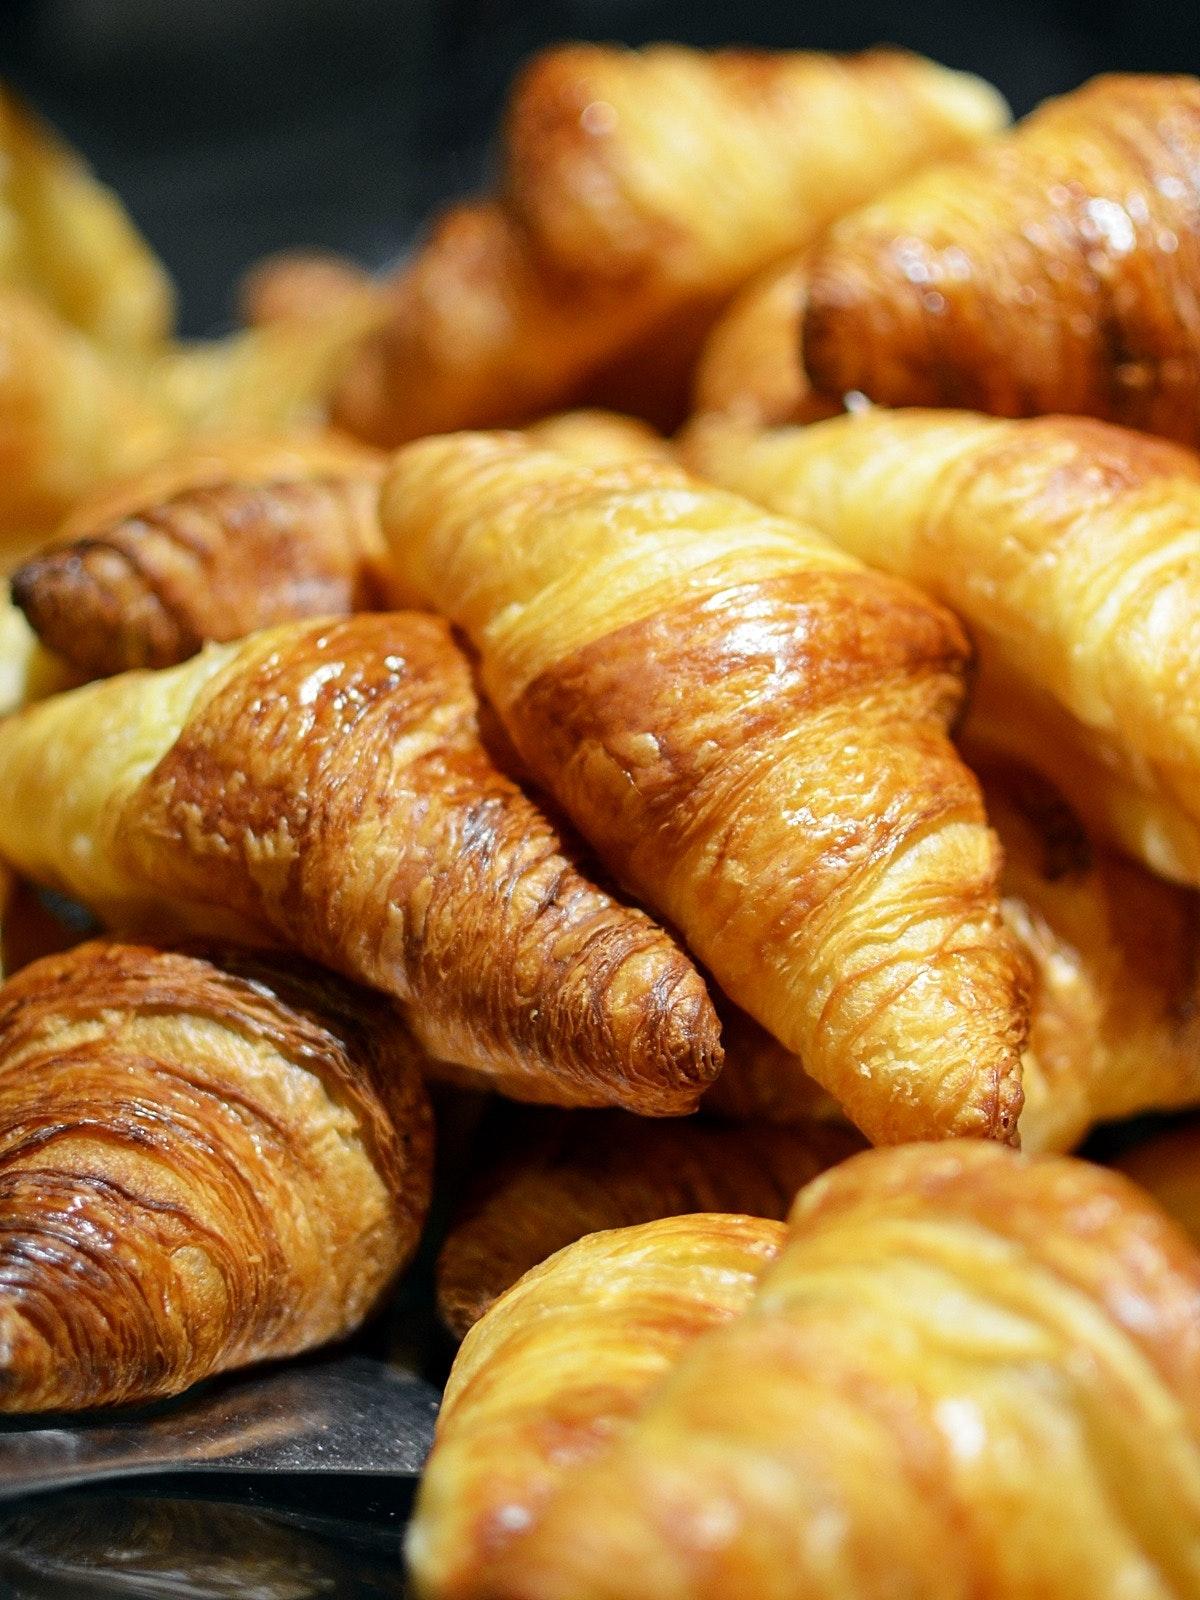 bakery-croissant-food-2135.jpg